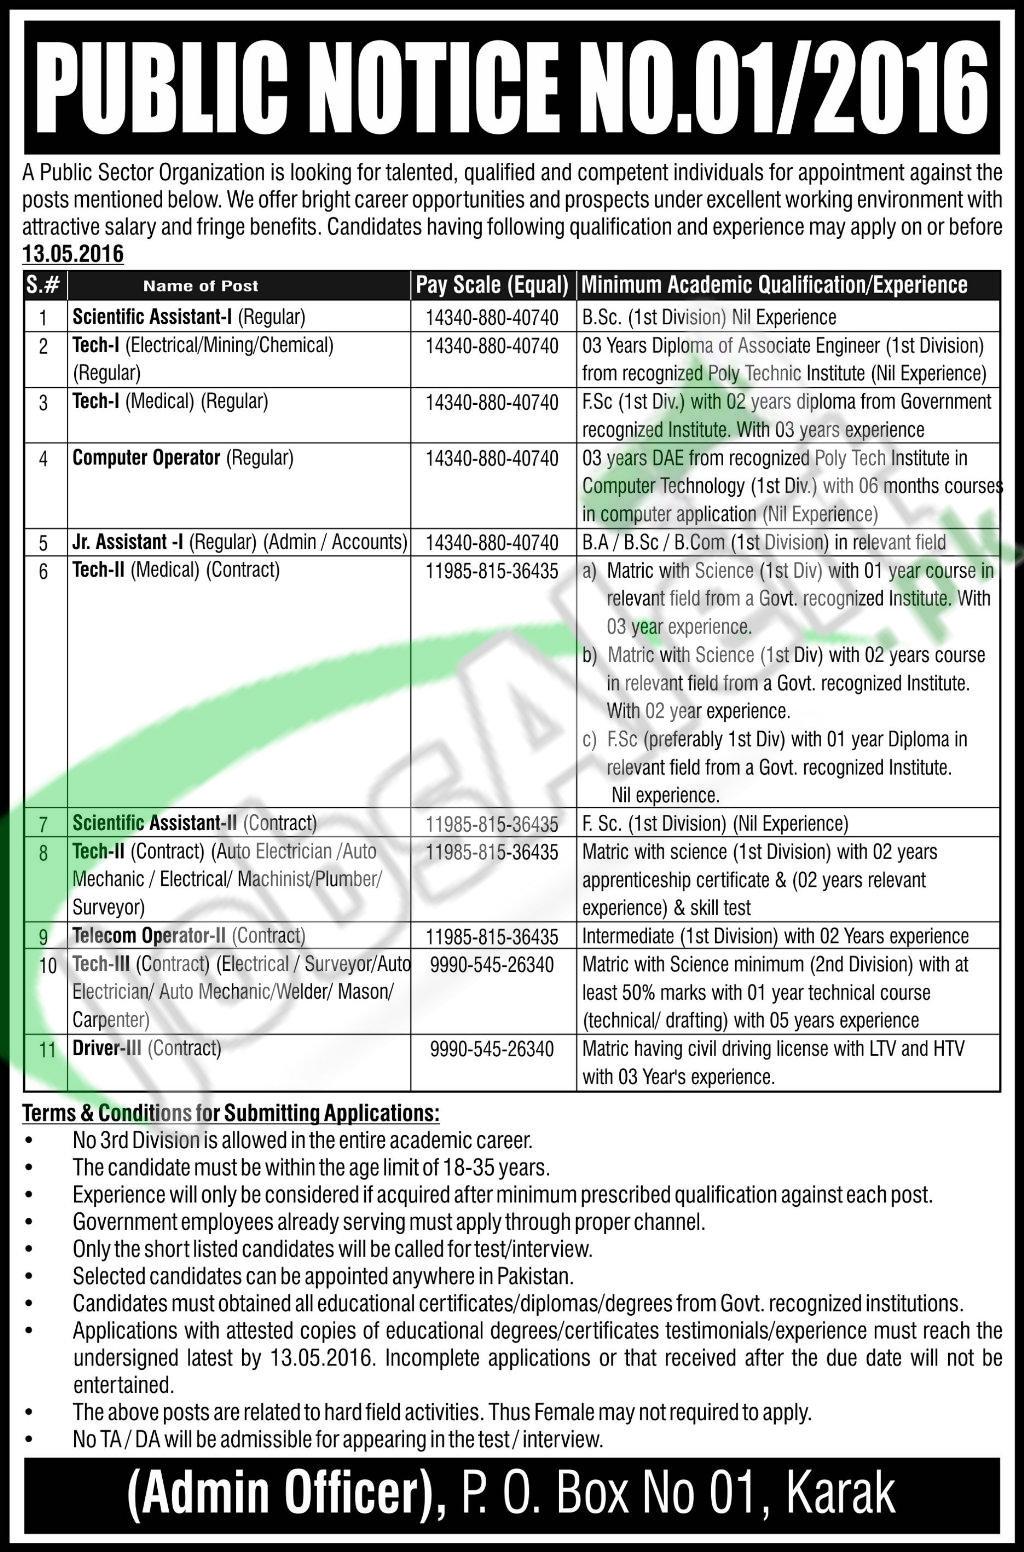 Public Sector Organization Jobs April 2016 For Technician & Assistants Eligibility Criteria